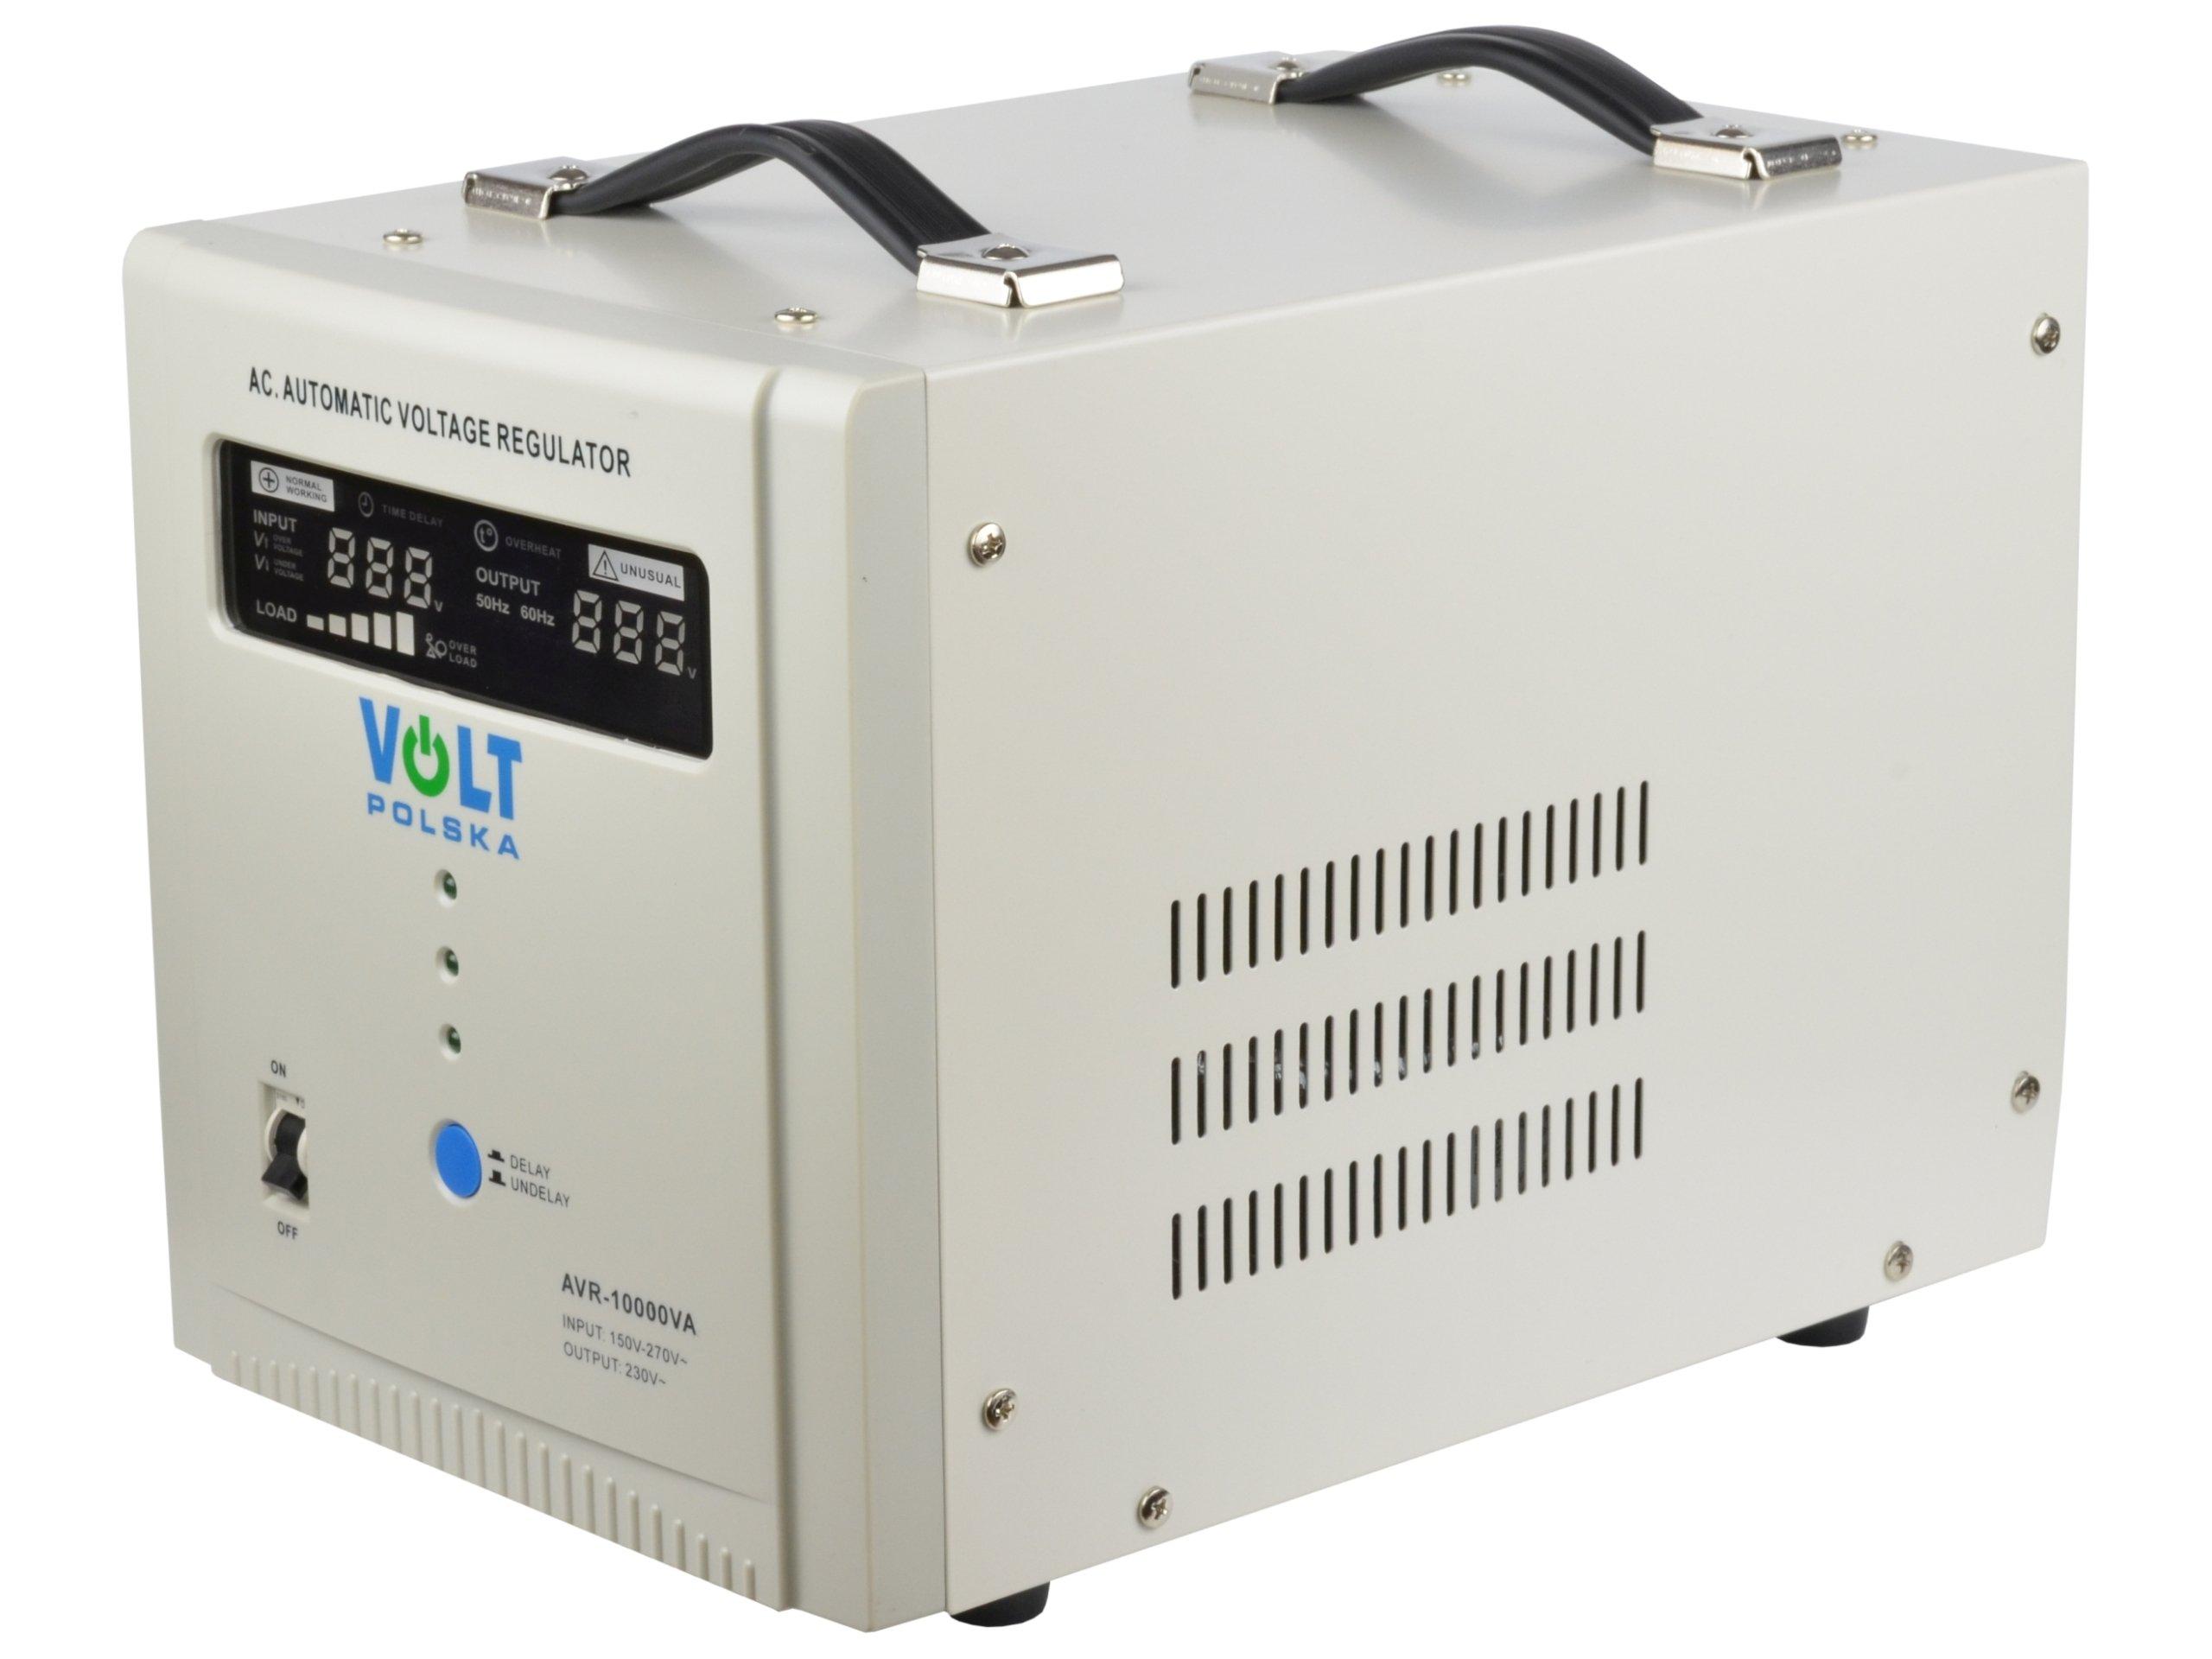 Stabilizator napięcia prądu do agregatu AVR 10000W